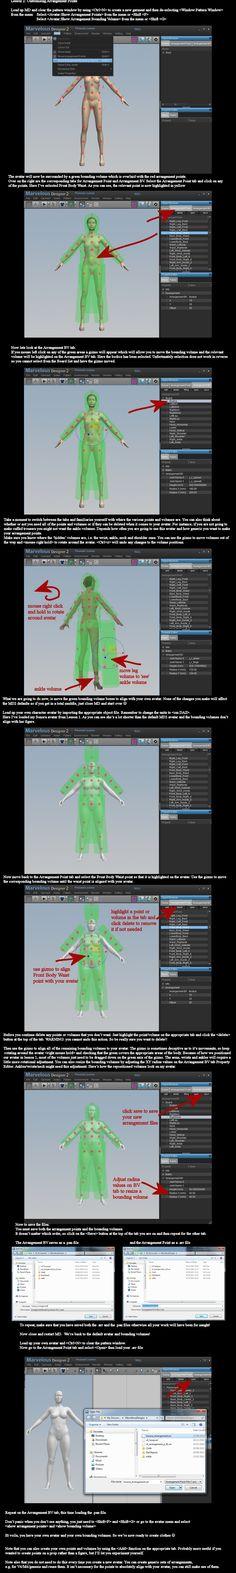 MD2 and DAZ Studio: Creating Arrangement Points by dylazuna